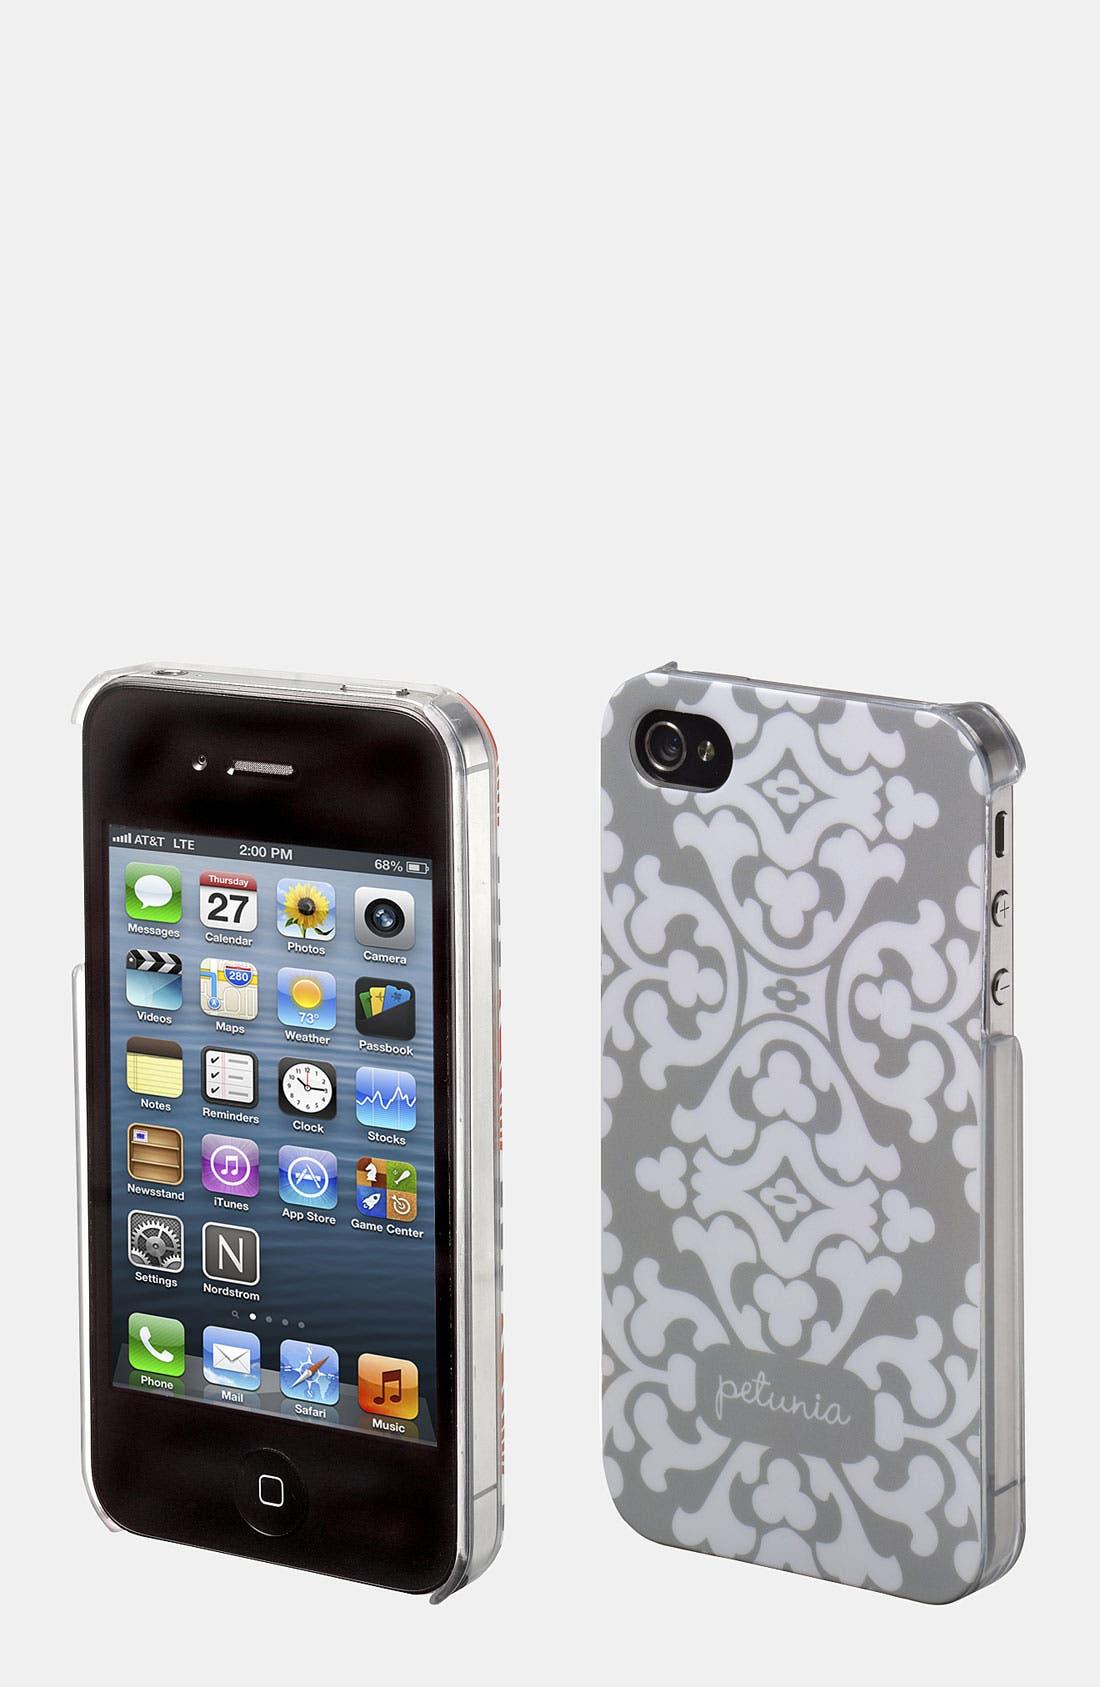 Main Image - Petunia Pickle Bottom 'Adorn' Hardcover iPhone 4 & 4S Case